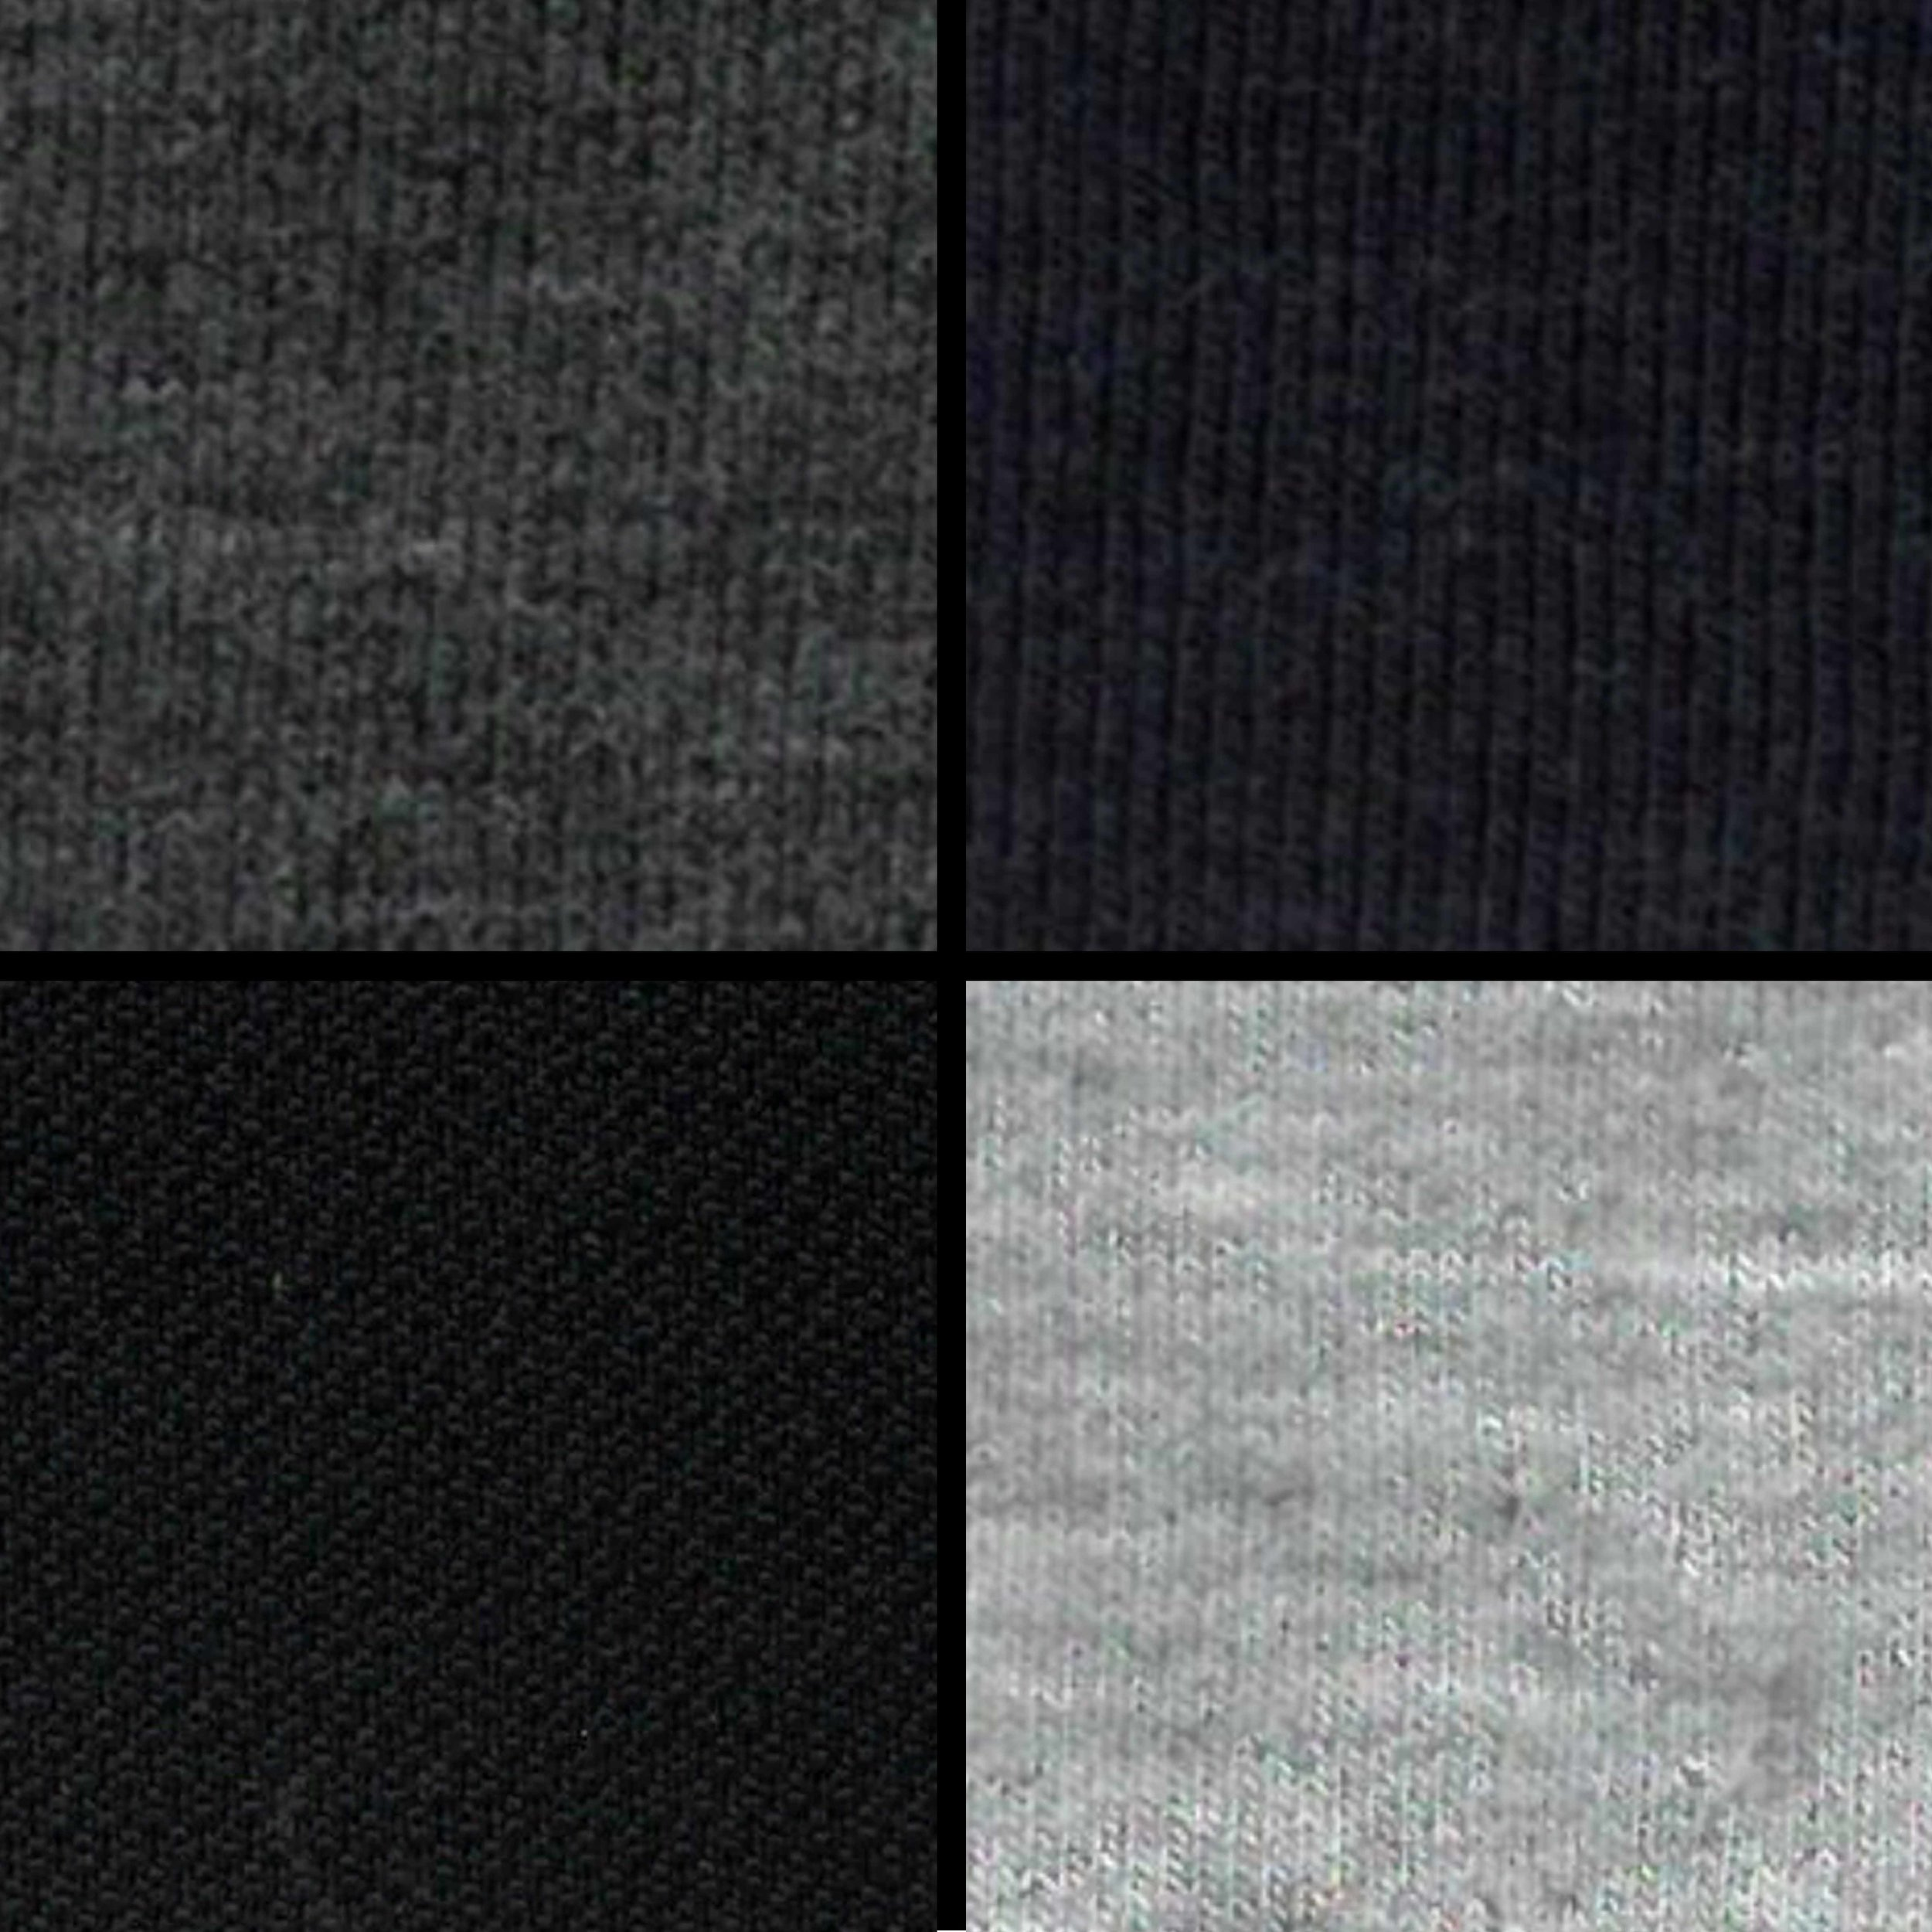 Swatch Hoodie - Bamboo Cotton Stretch Fleece.jpg